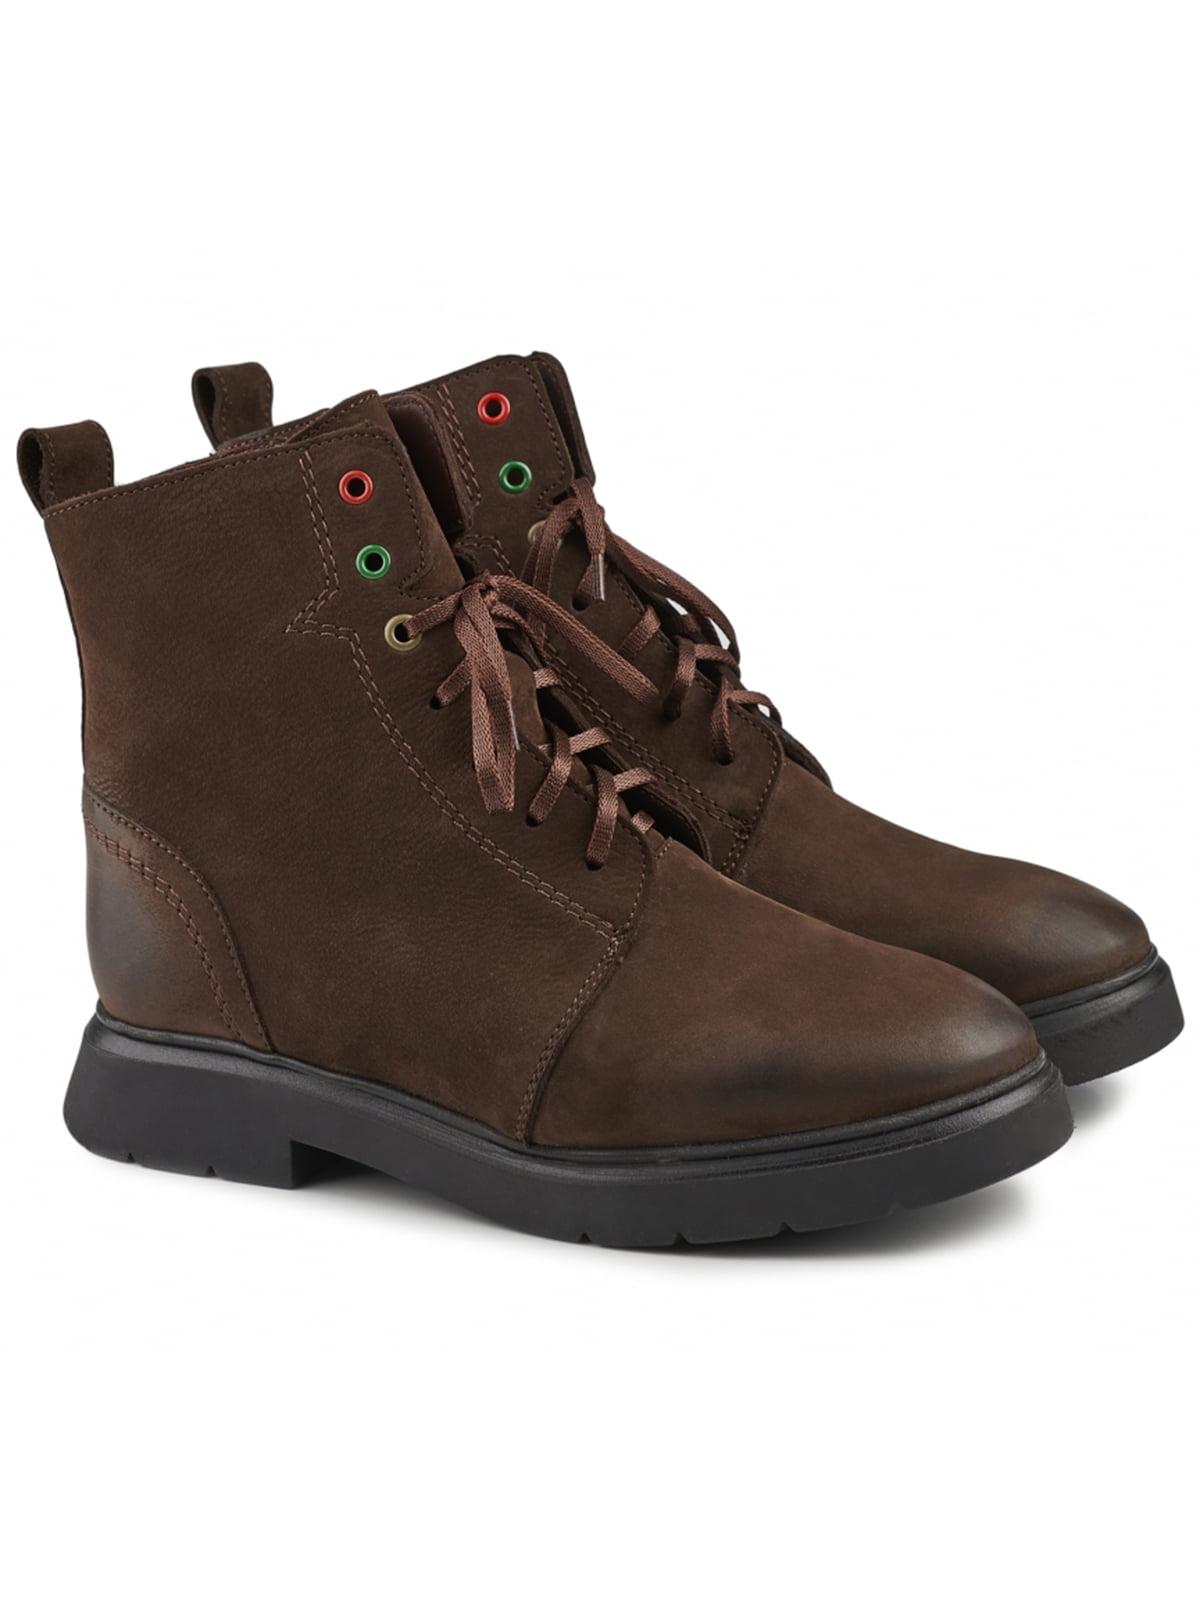 Ботинки коричневые | 5635945